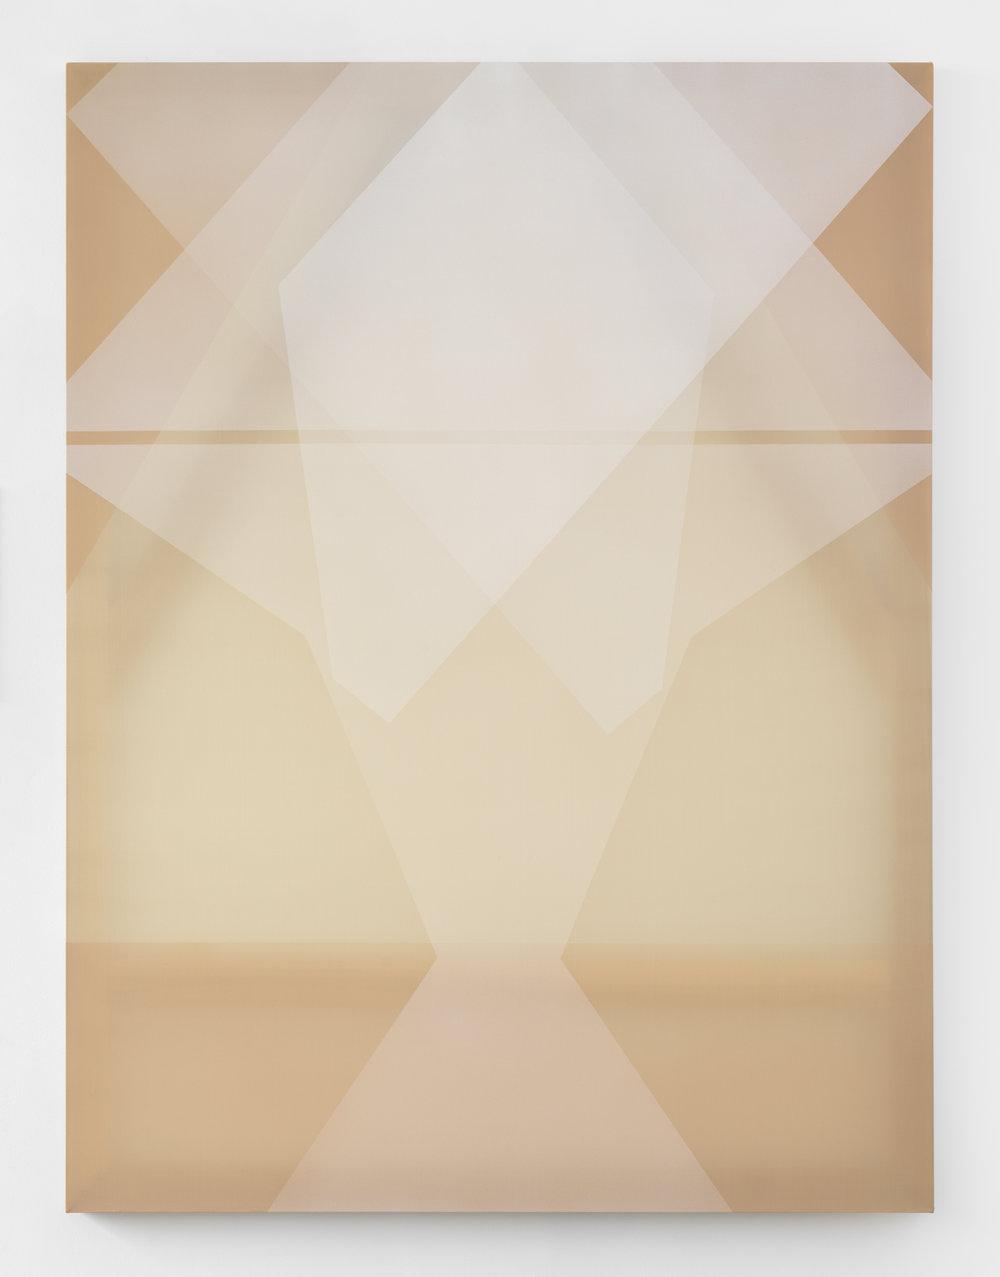 white morph  acrylic on silk 60 in x 45 in 2018